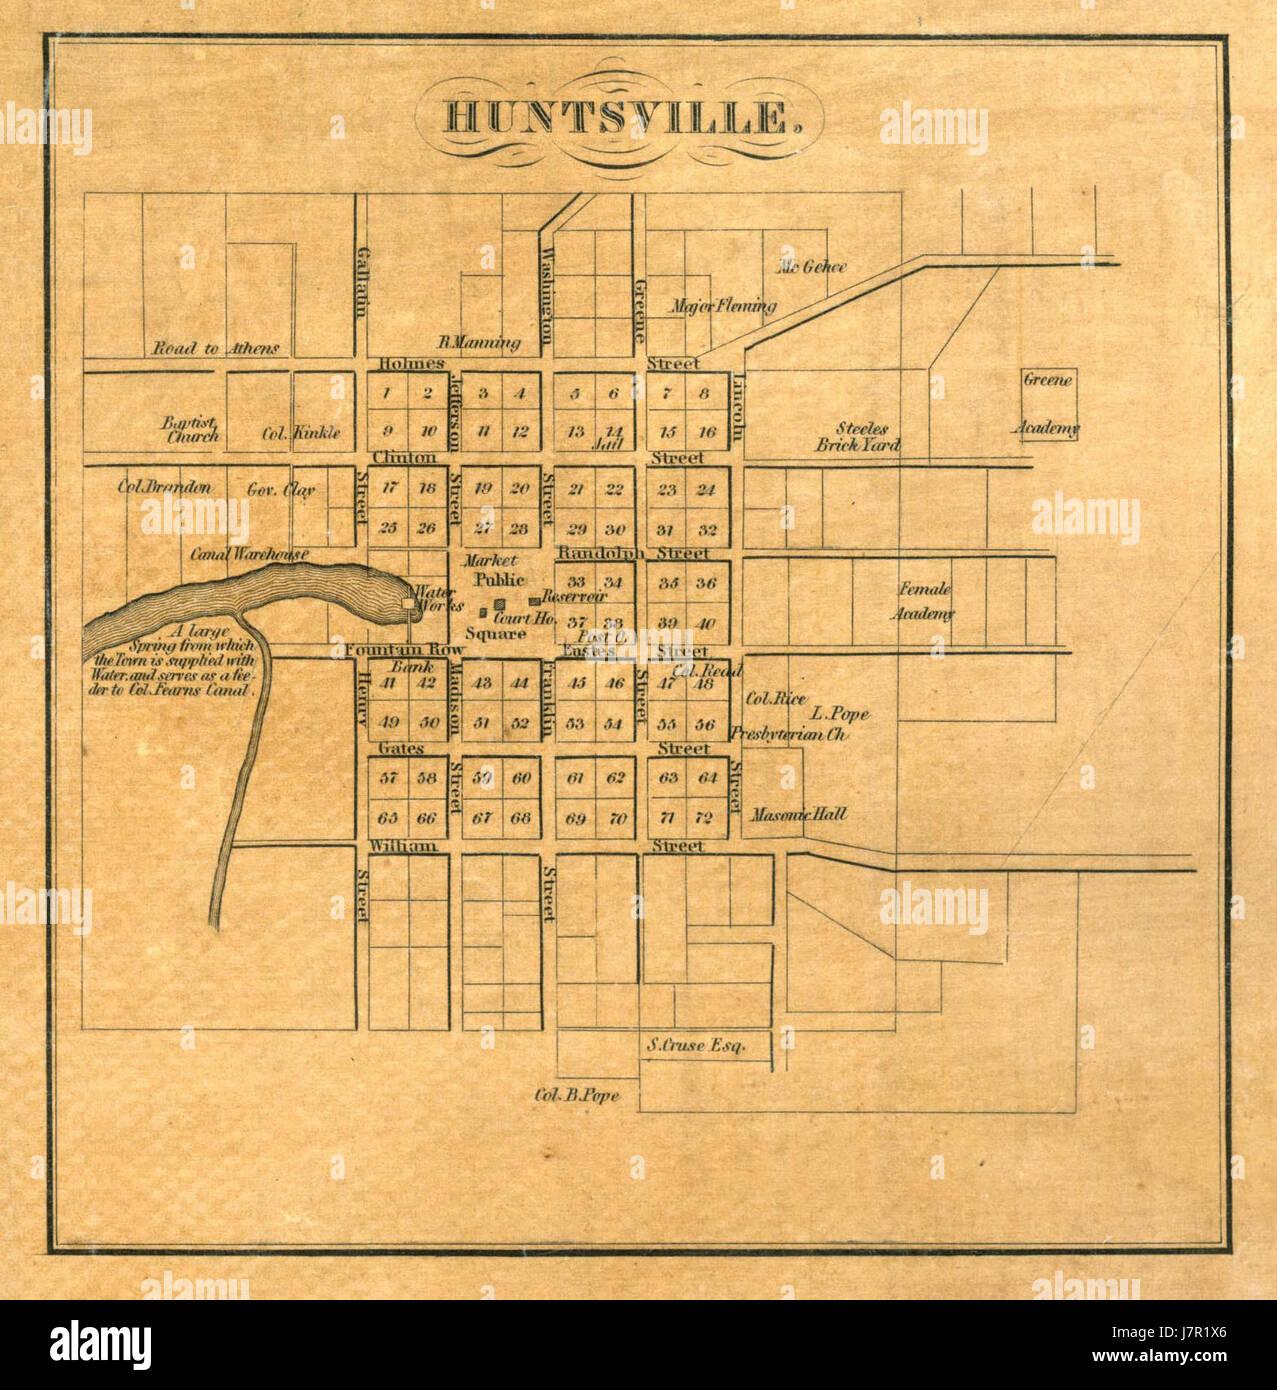 Map Of Huntsville Alabama Stock Photos & Map Of Huntsville ...